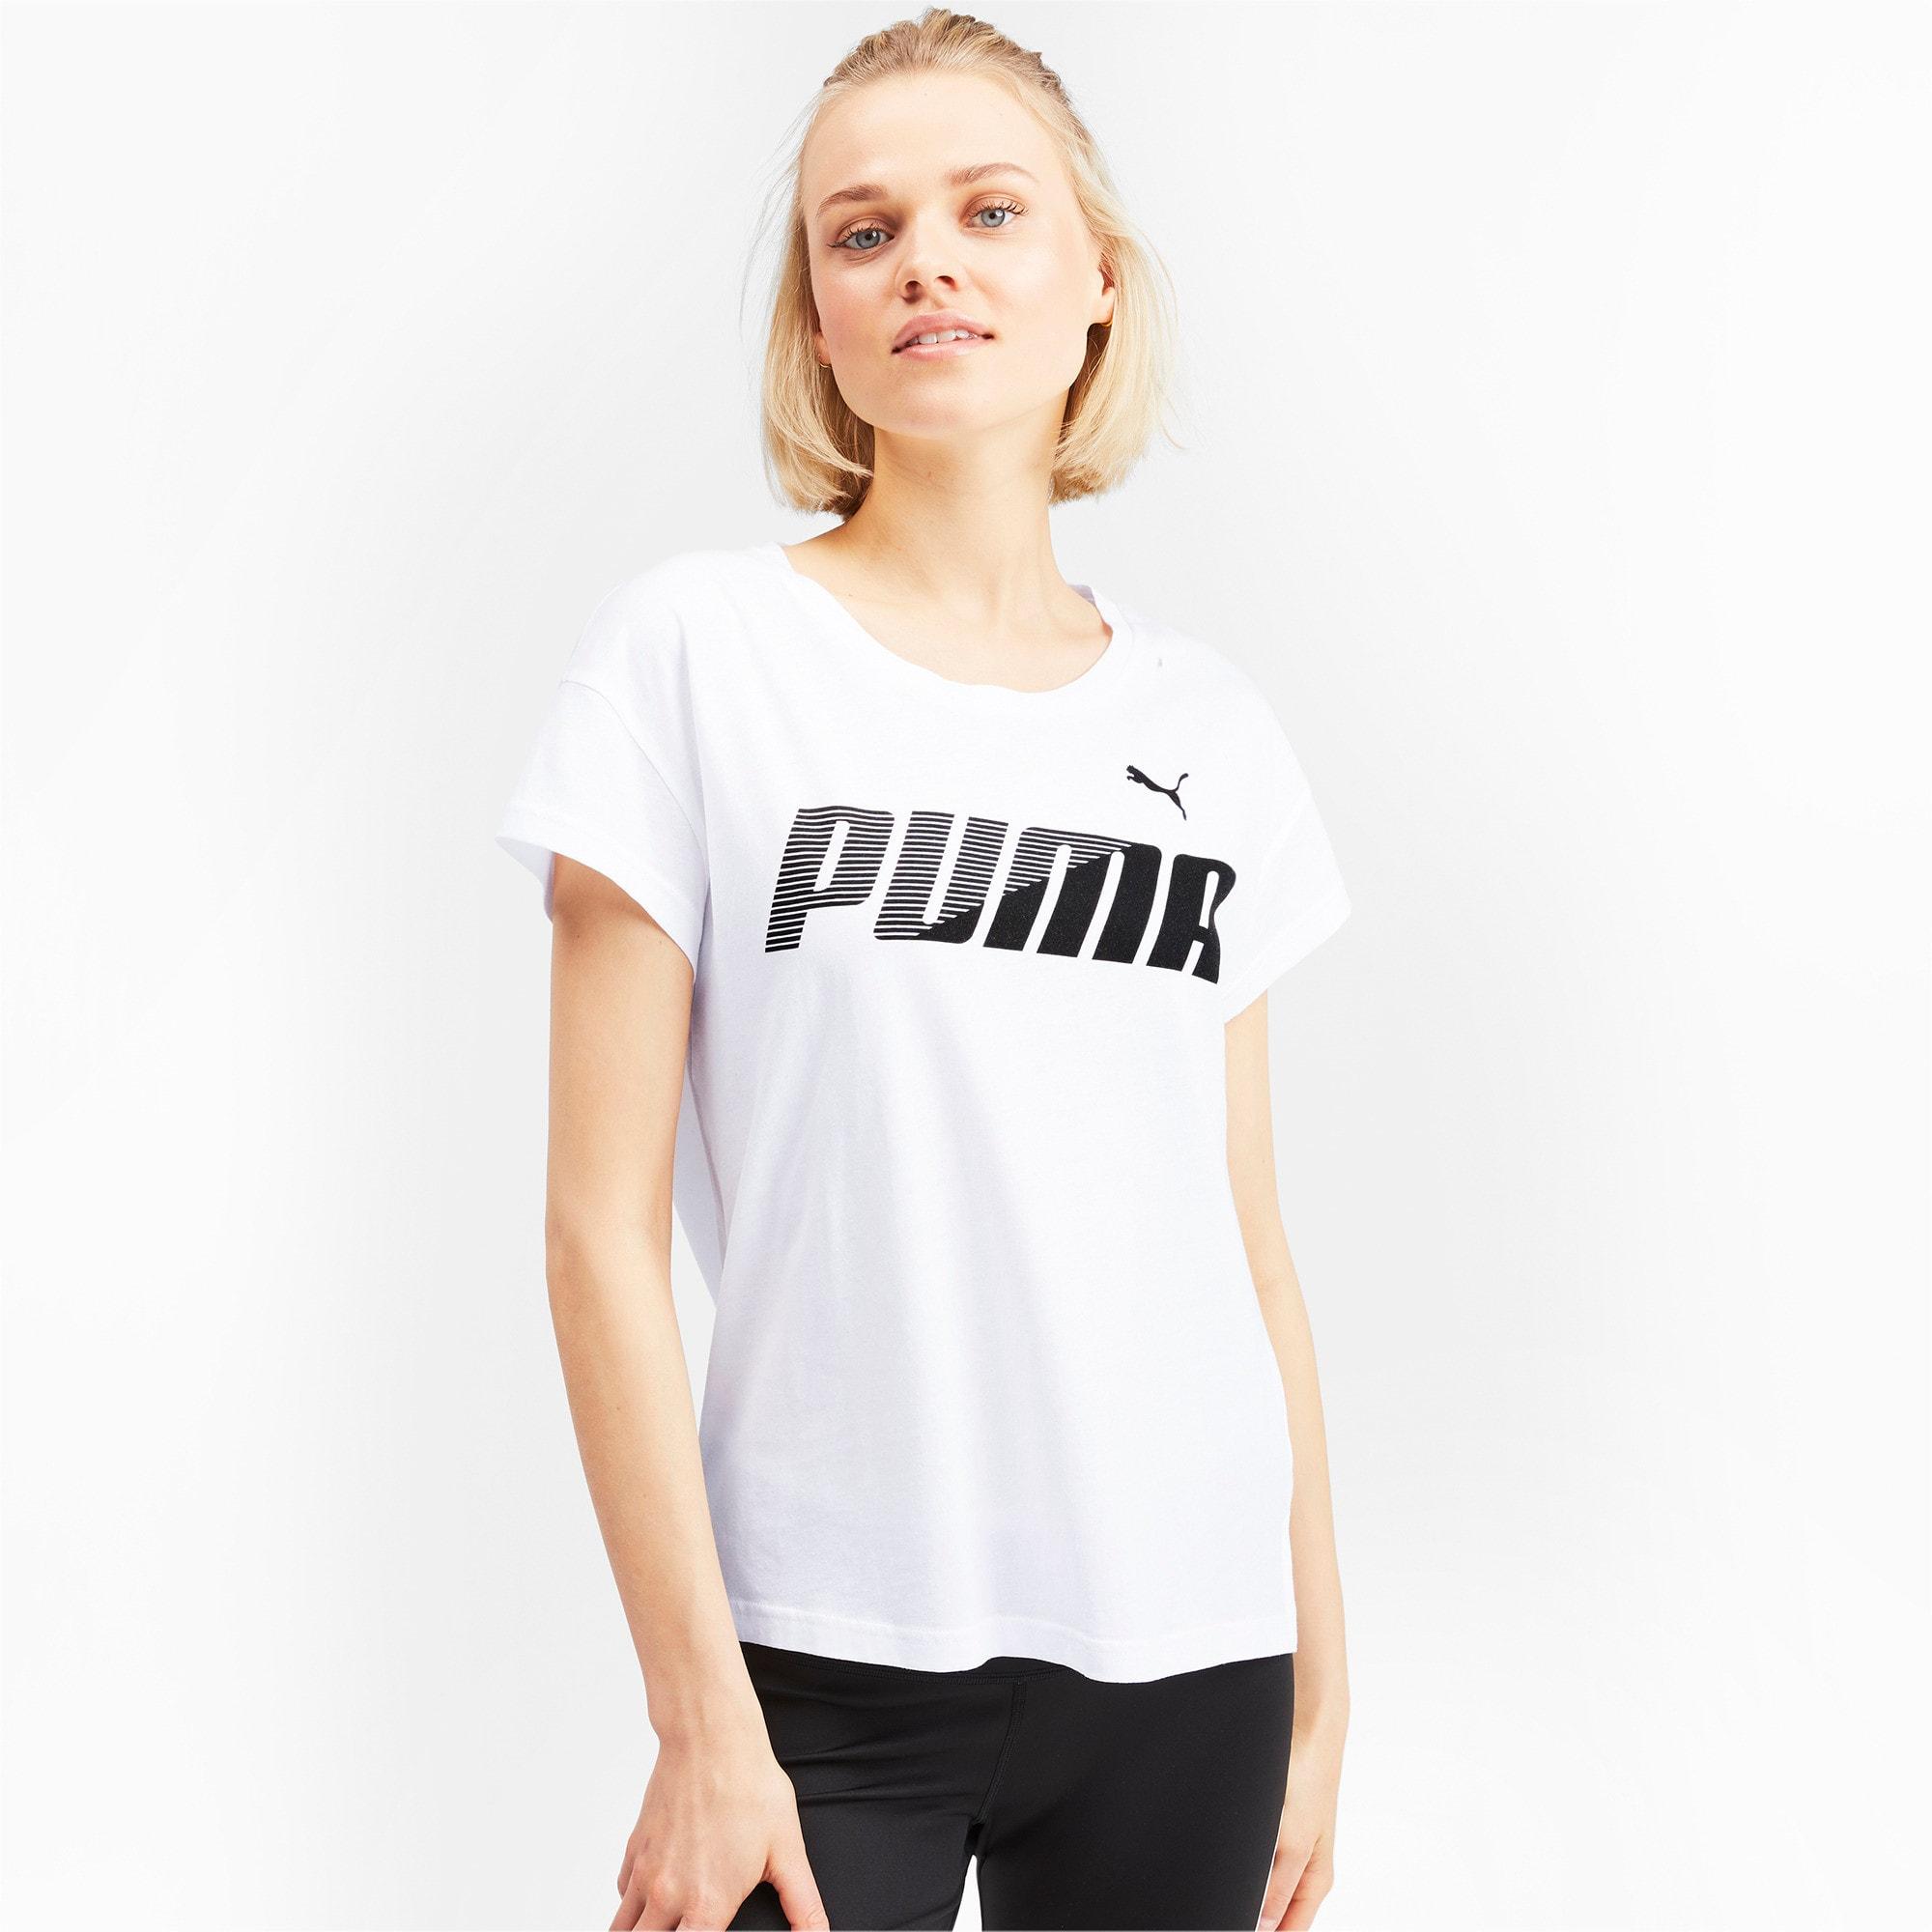 Miniatura 1 de Camiseta estampadaModernSports de mujer, Puma White, mediano